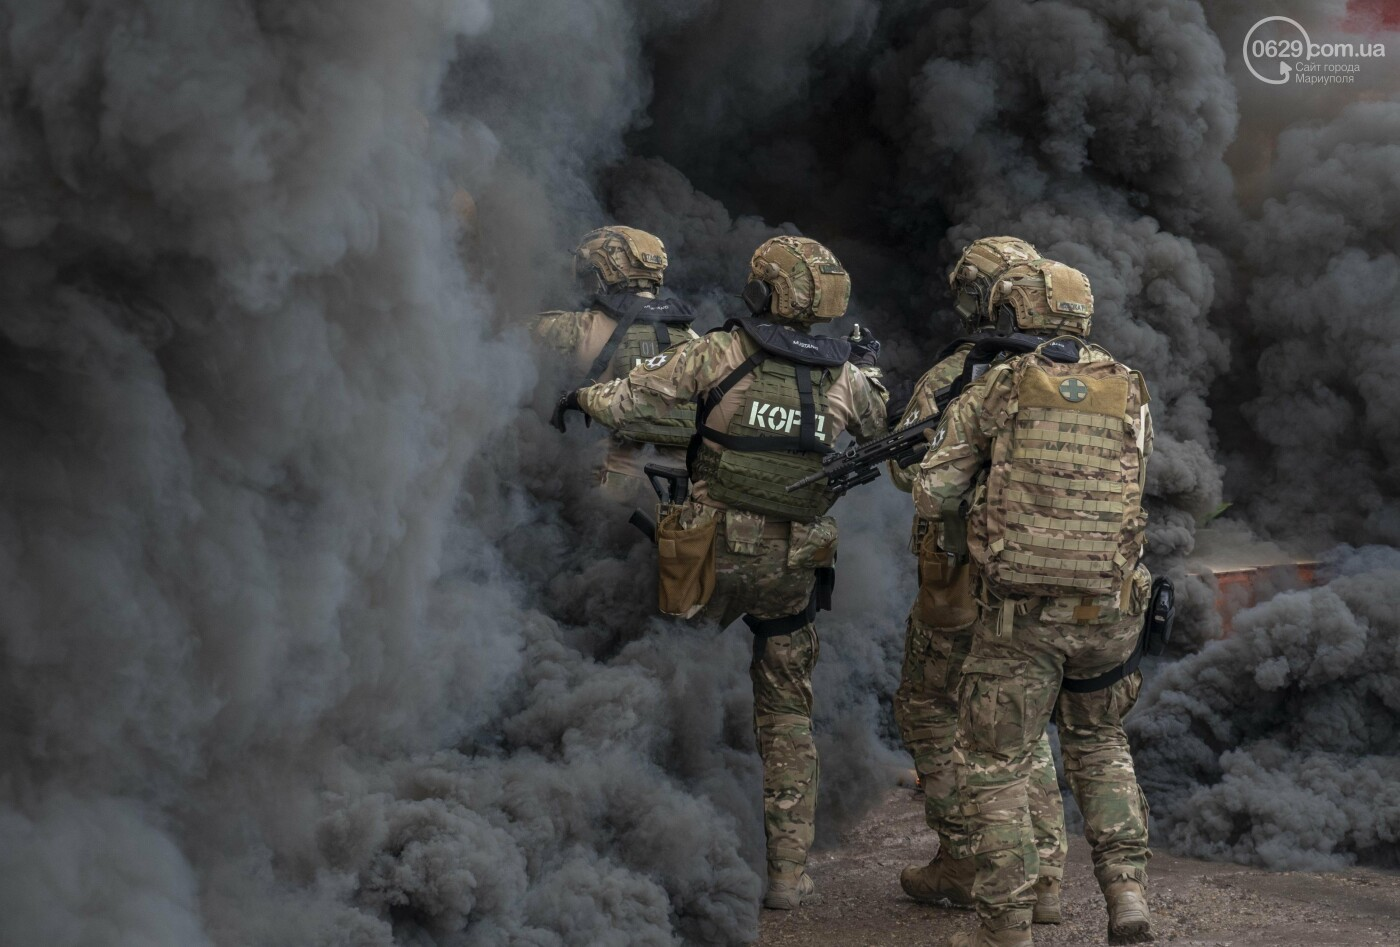 """Враг понесет потери"". Как в Мариуполе силовики учились уничтожать врага на суше и на море, - ФОТО+ВИДЕО, фото-8"